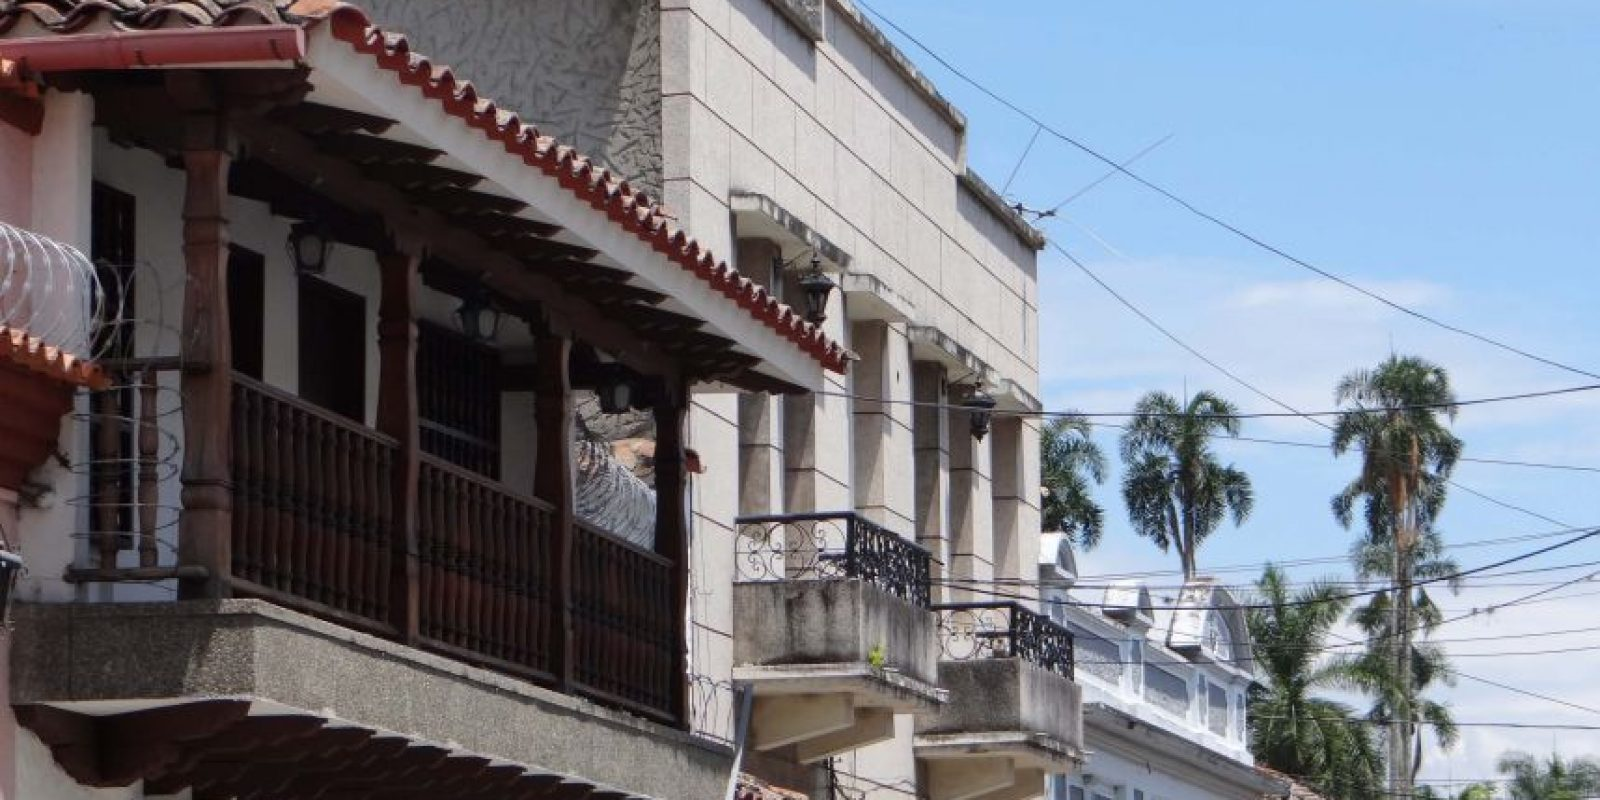 La arquitectura de las fachadas de las casas de Buga. Foto: Diego Hernán Pérez S. /PUBLIMETRO